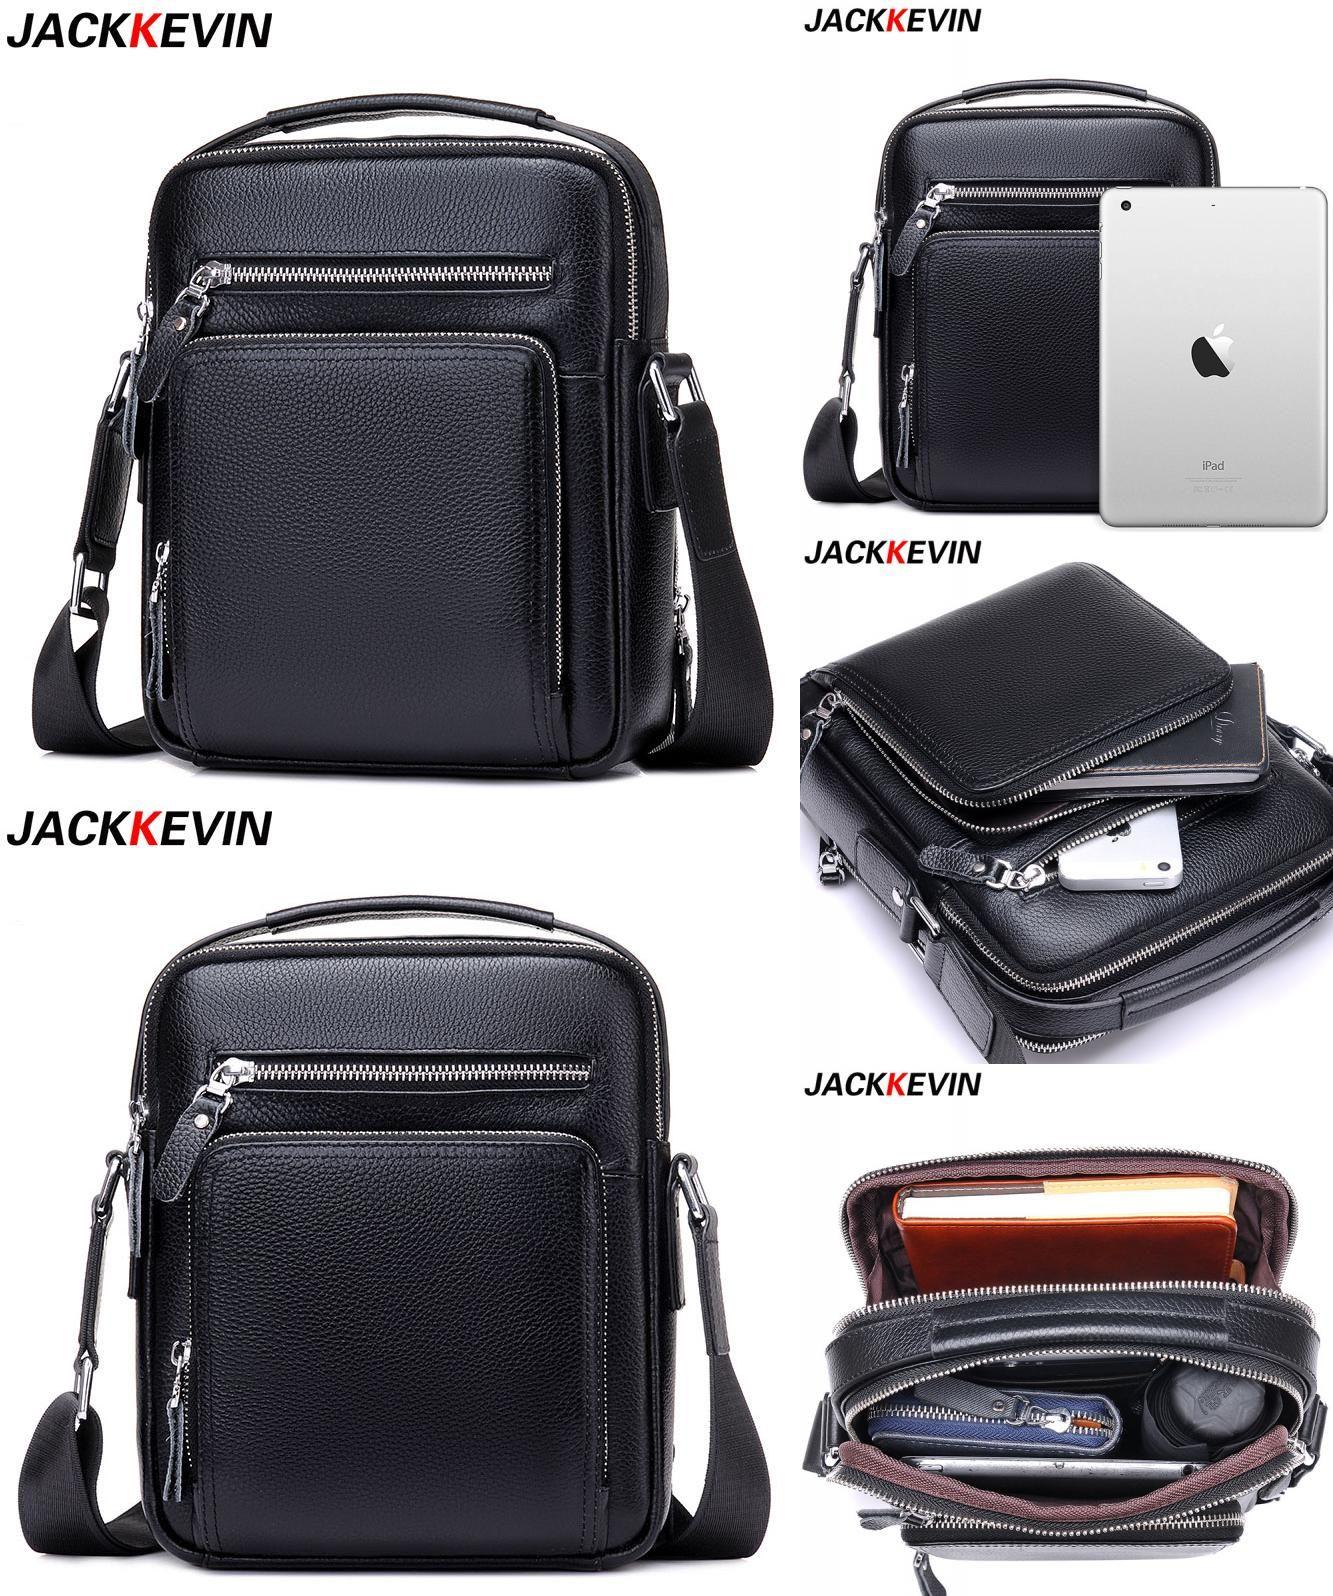 b1f3bbd8e1de  Visit to Buy  JACKKEVIN Top Quality 100% Genuine Leather Bag Men iPad  Tabelt